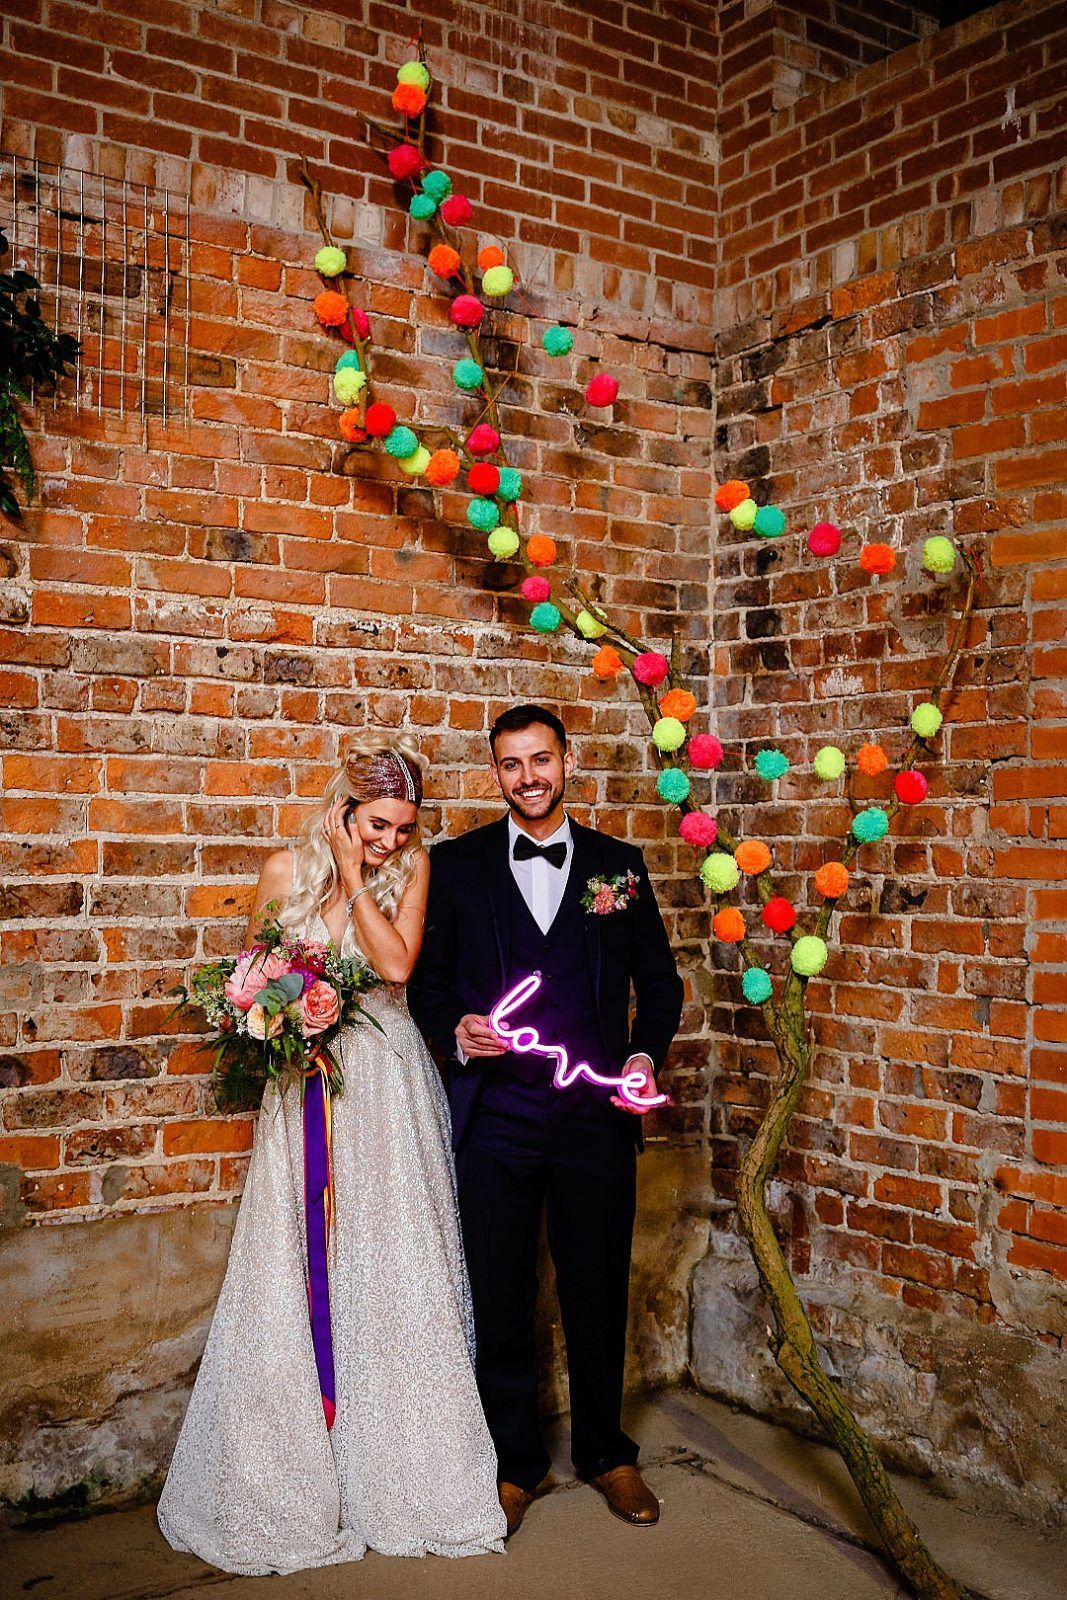 400 Best Festival Wedding Images In 2020 Festival Wedding Festival Wedding